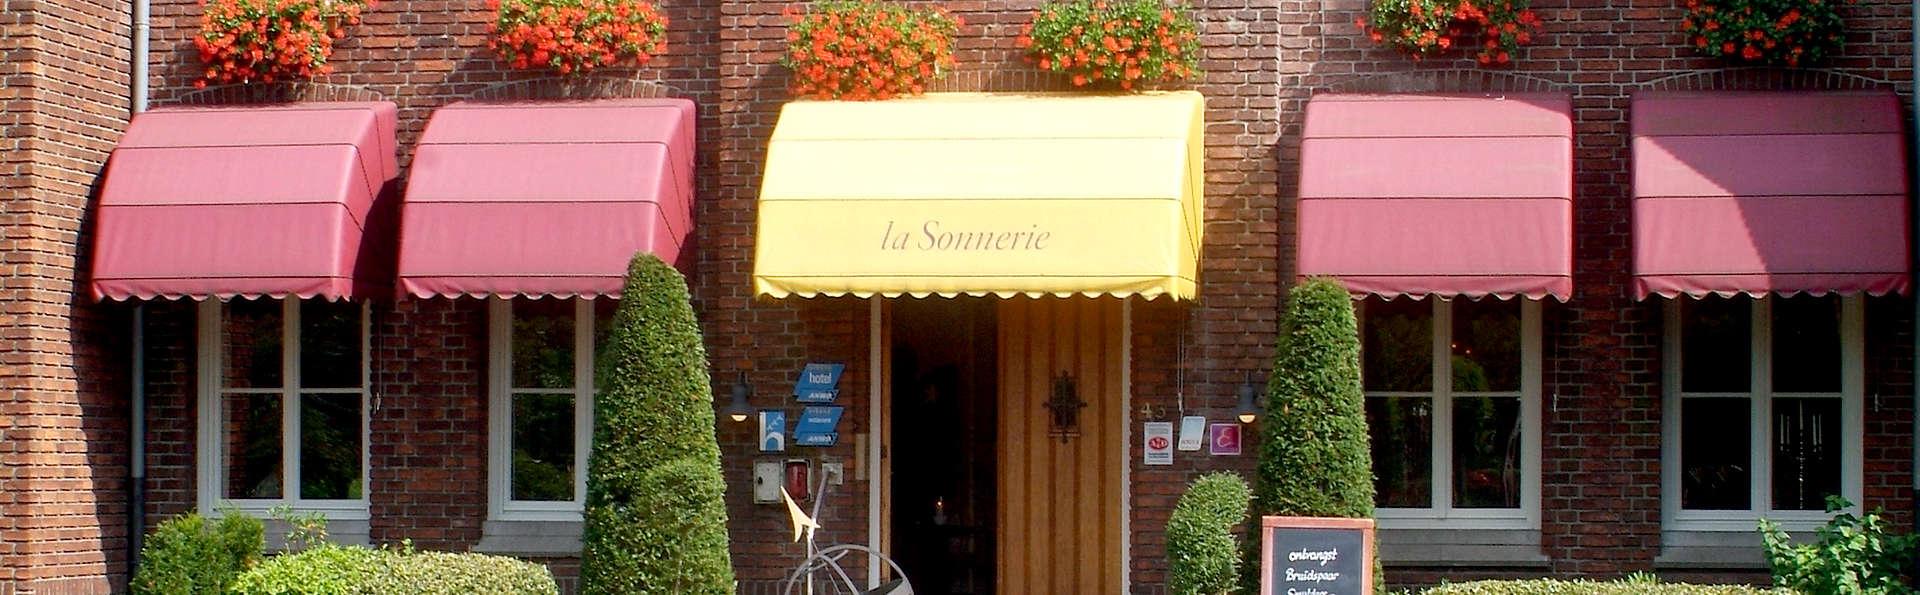 La Sonnerie Hotel - Edit_Front2.jpg